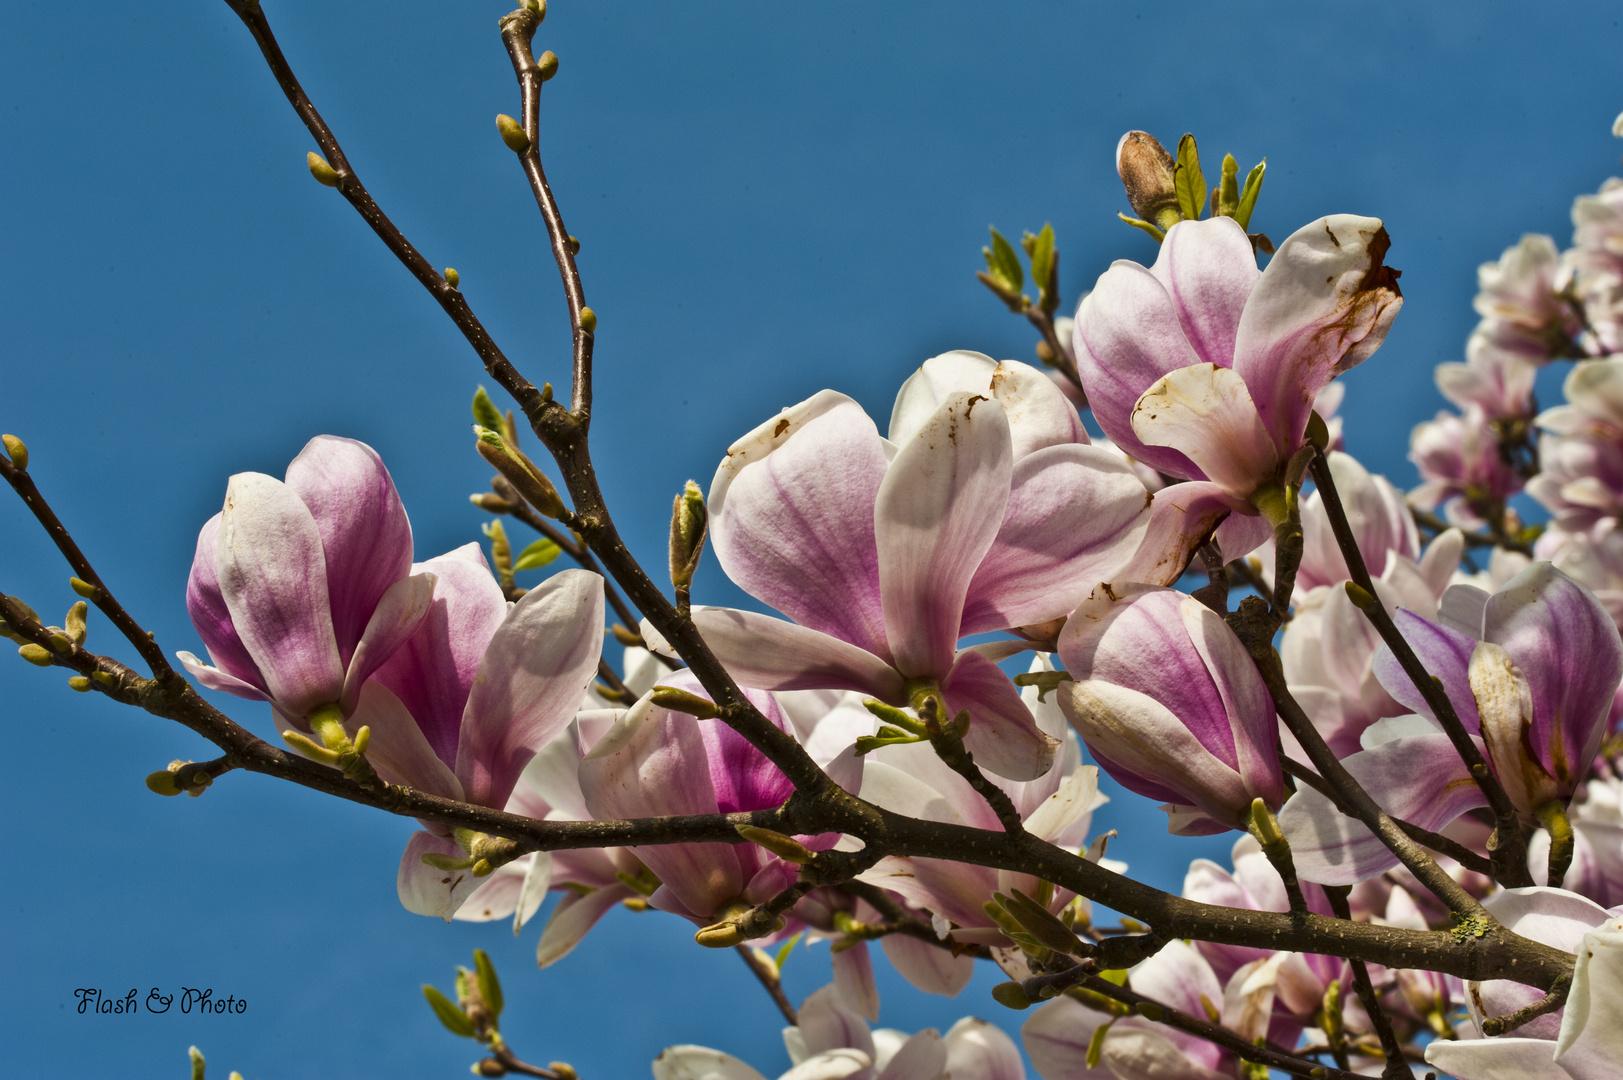 Magnolienblüte2